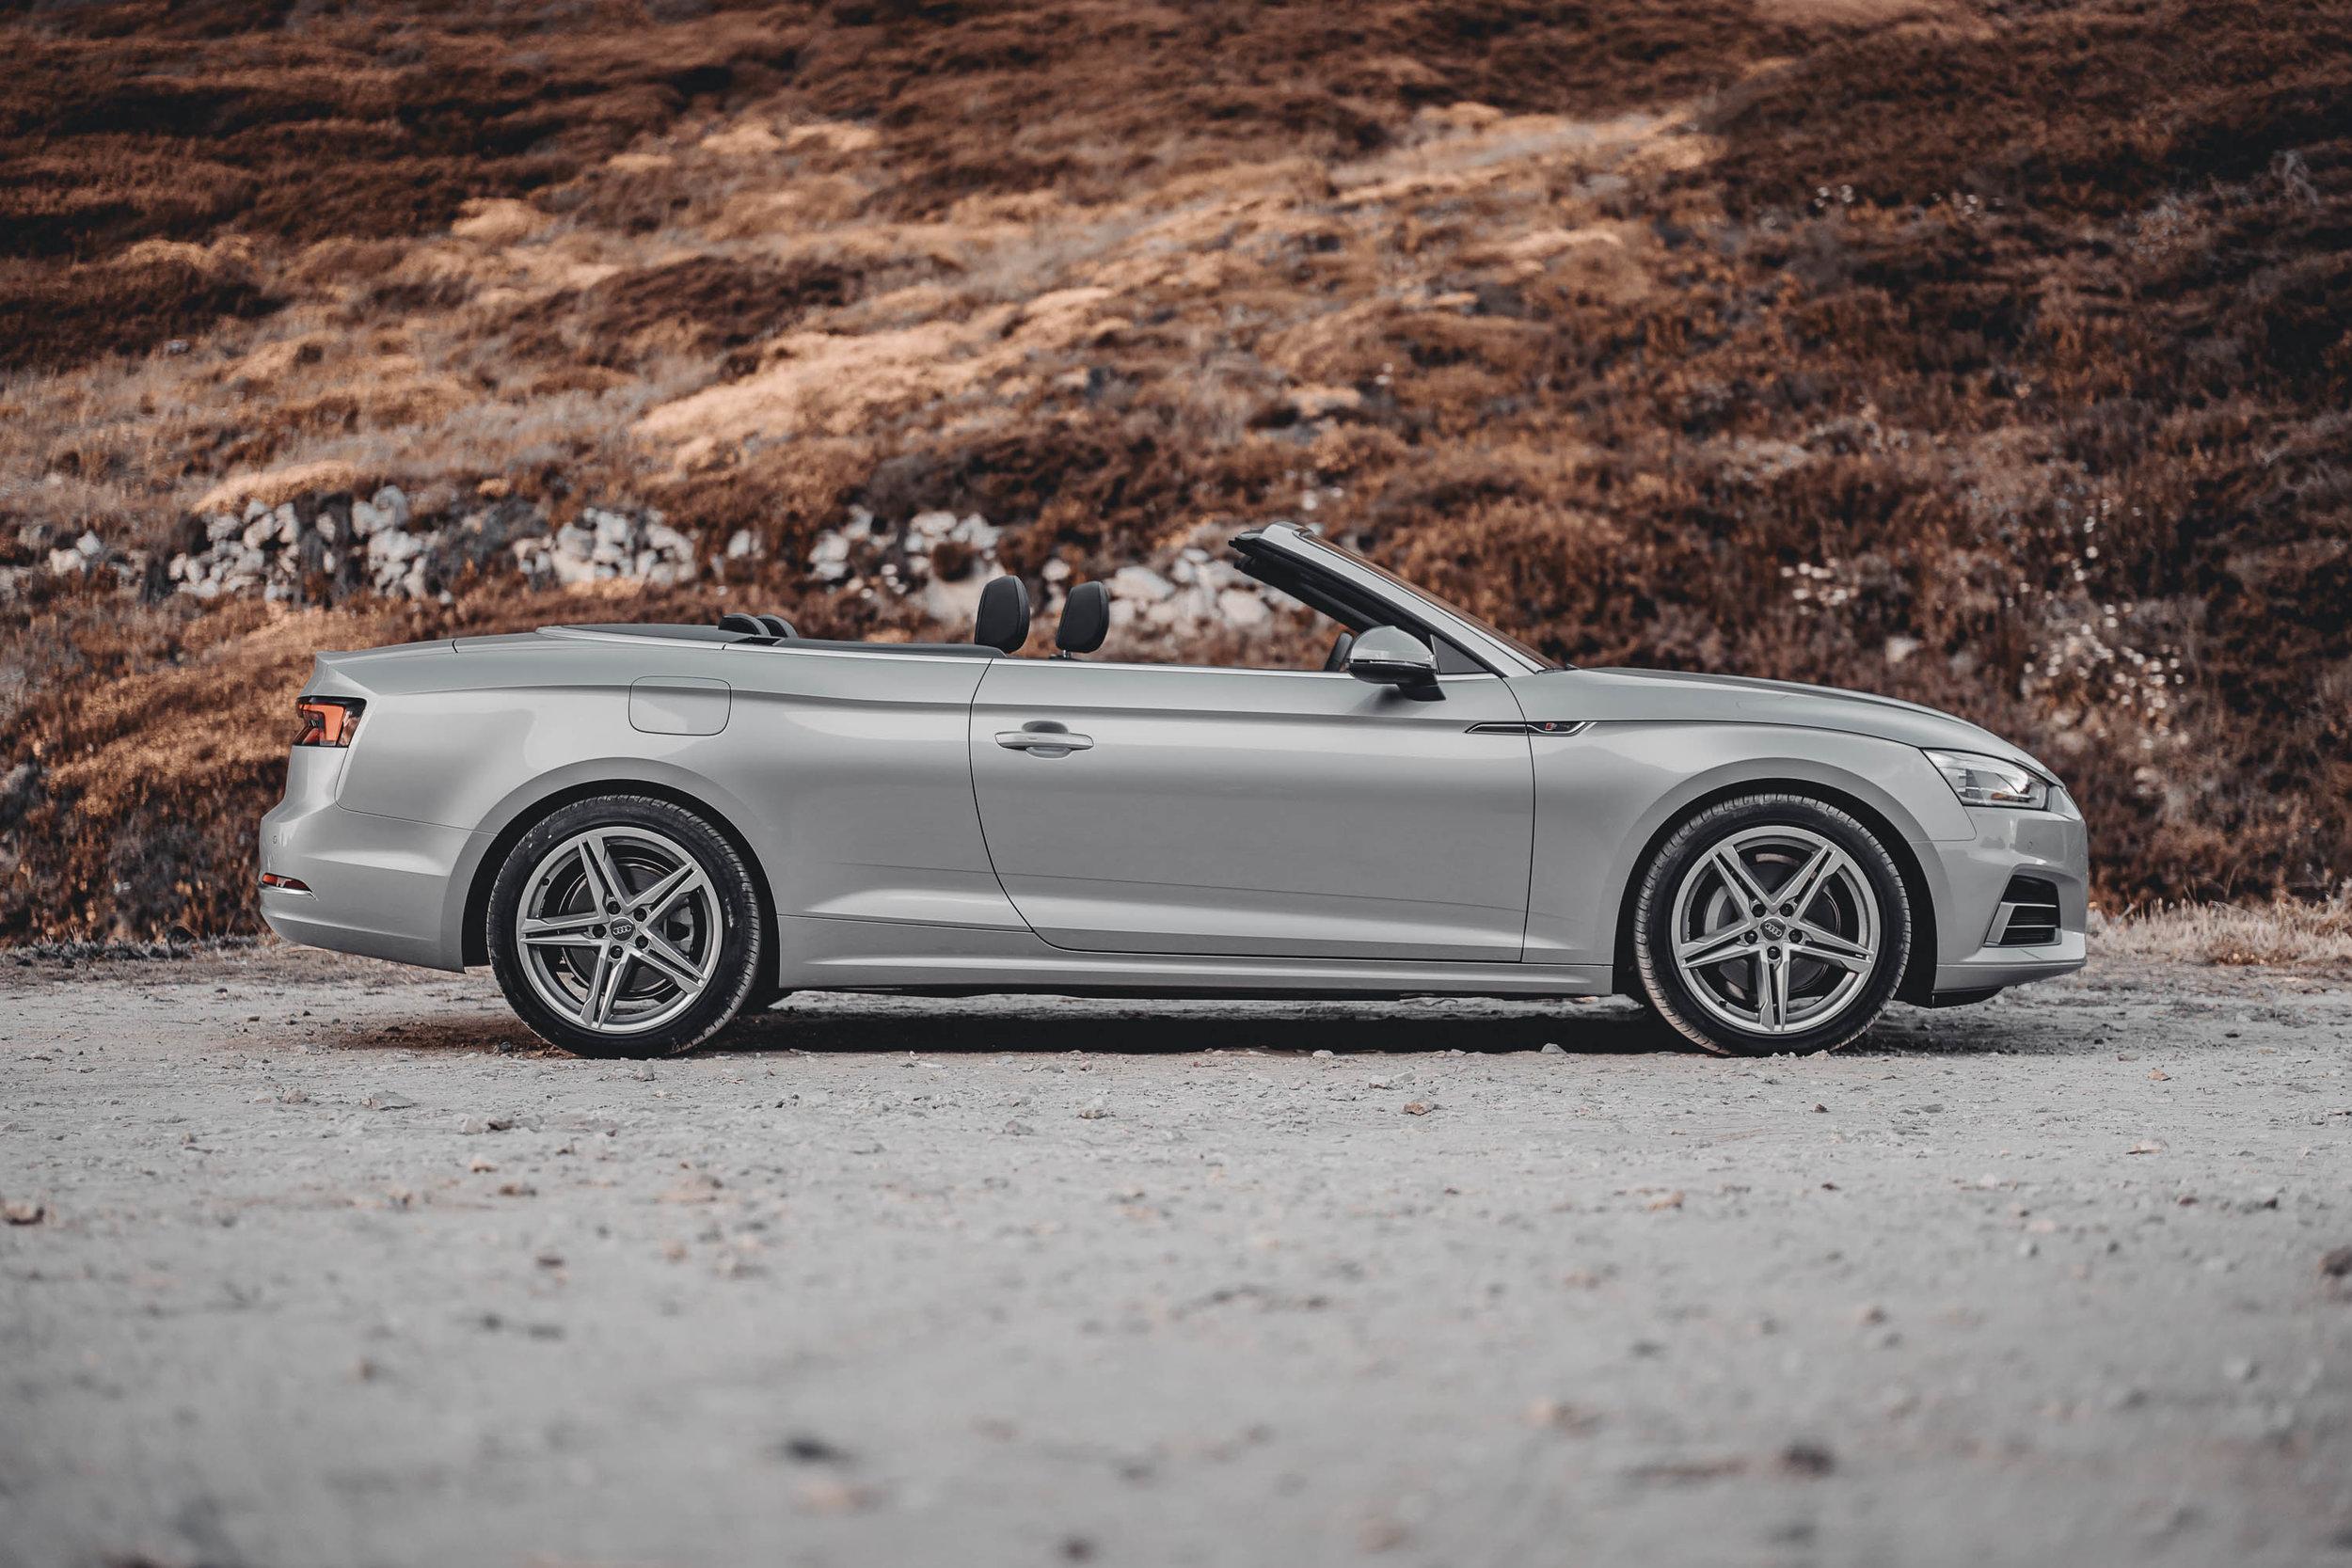 Maximilian_Otto_Audi_A5_Cabriolet_Portugal_12_WEB.jpg